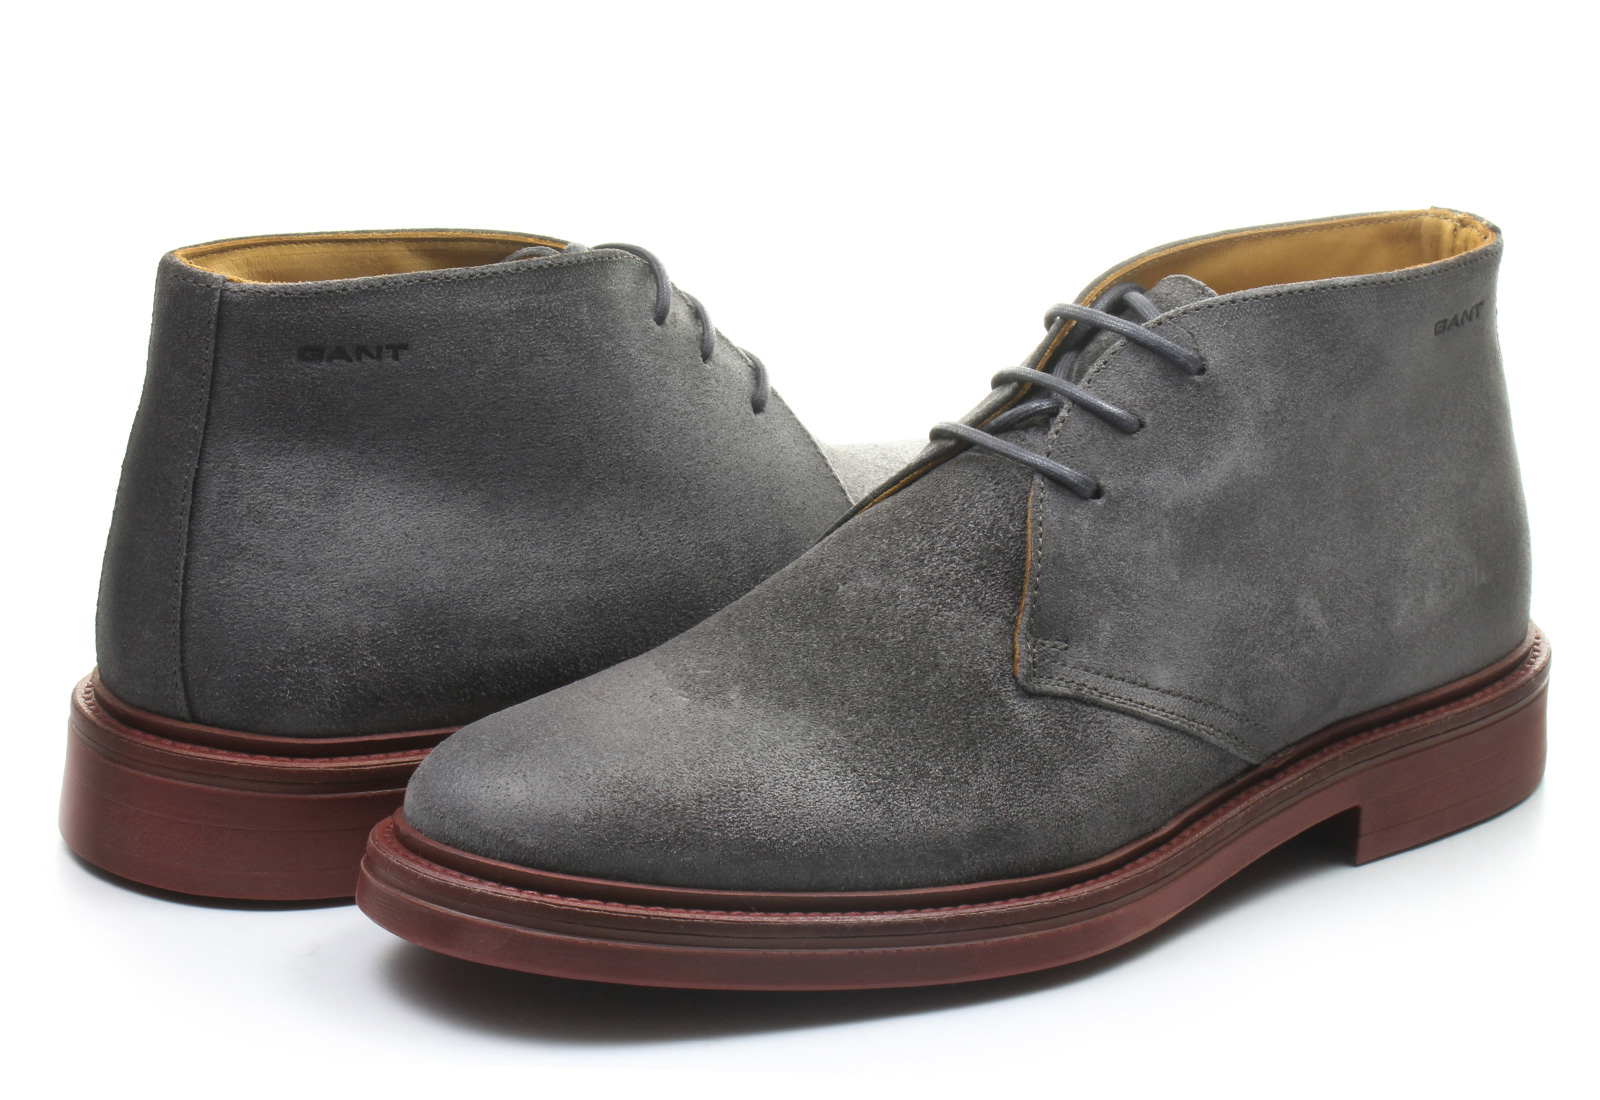 Gant Shoe Willow 11643898 G84 Online Shop For